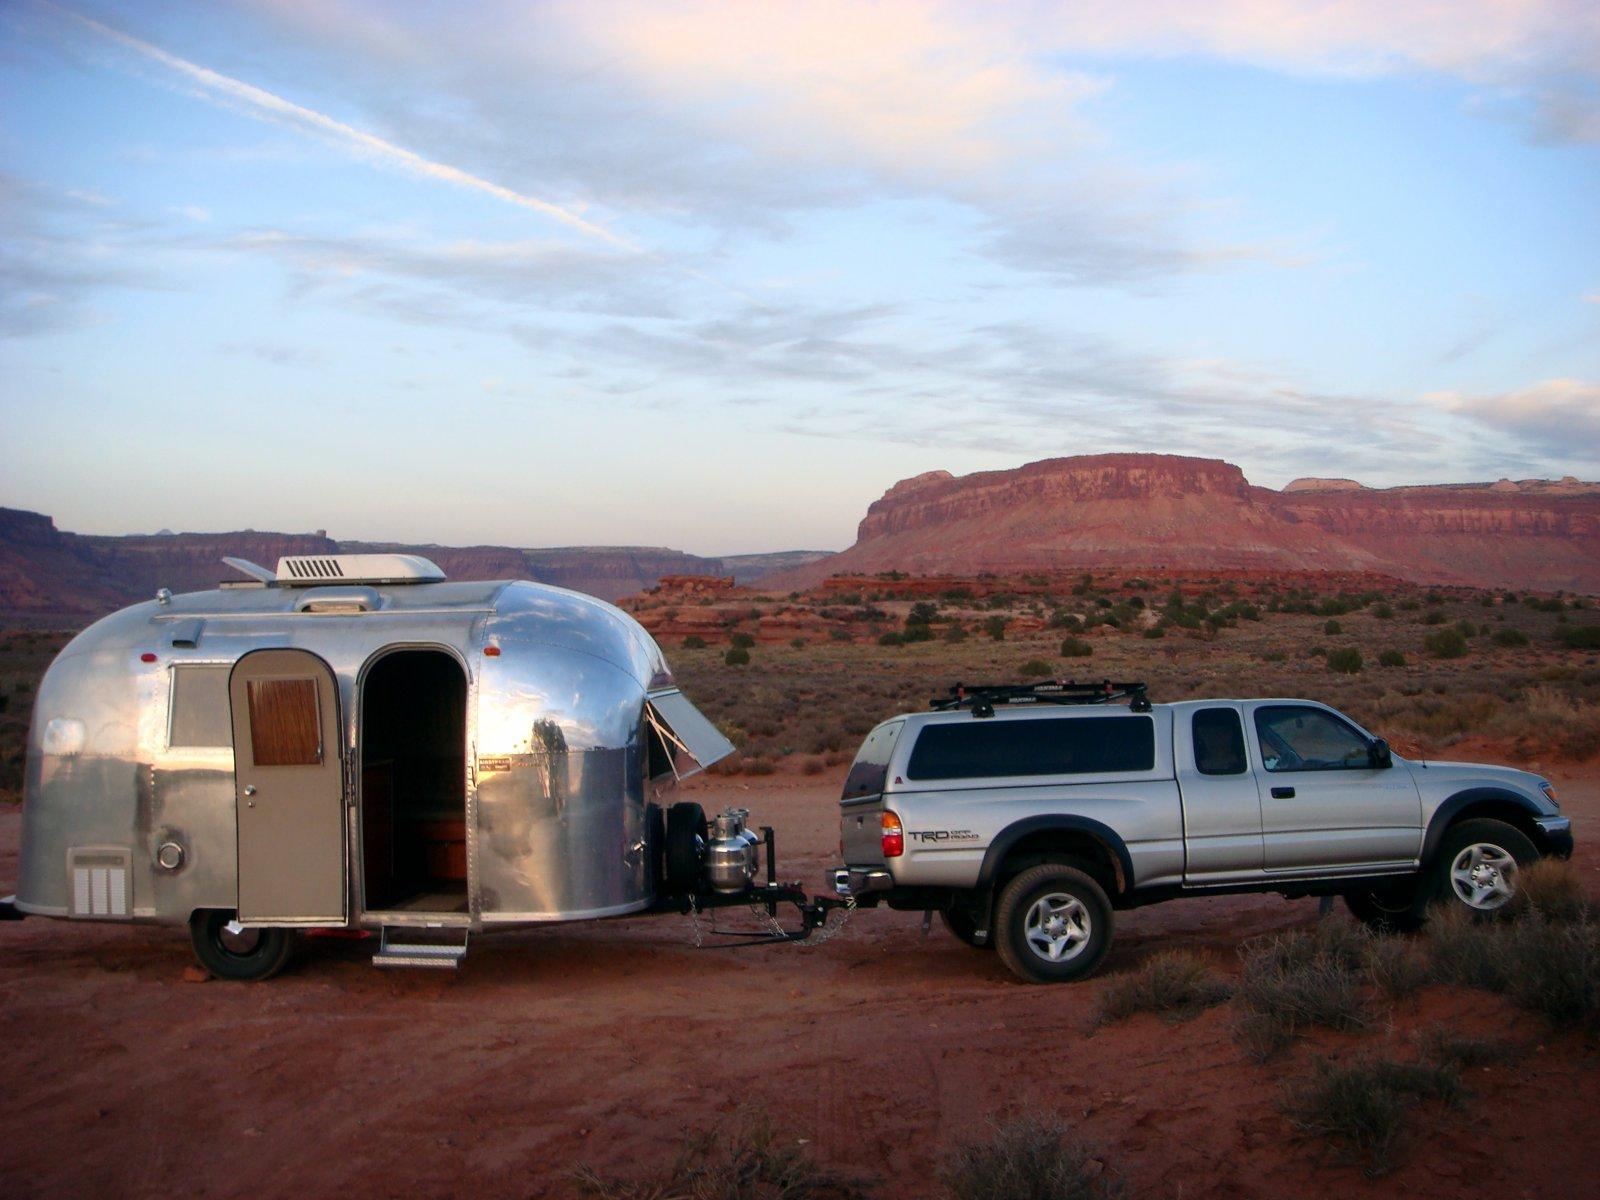 Click image for larger version  Name:Desert 2.jpg Views:117 Size:210.2 KB ID:183748